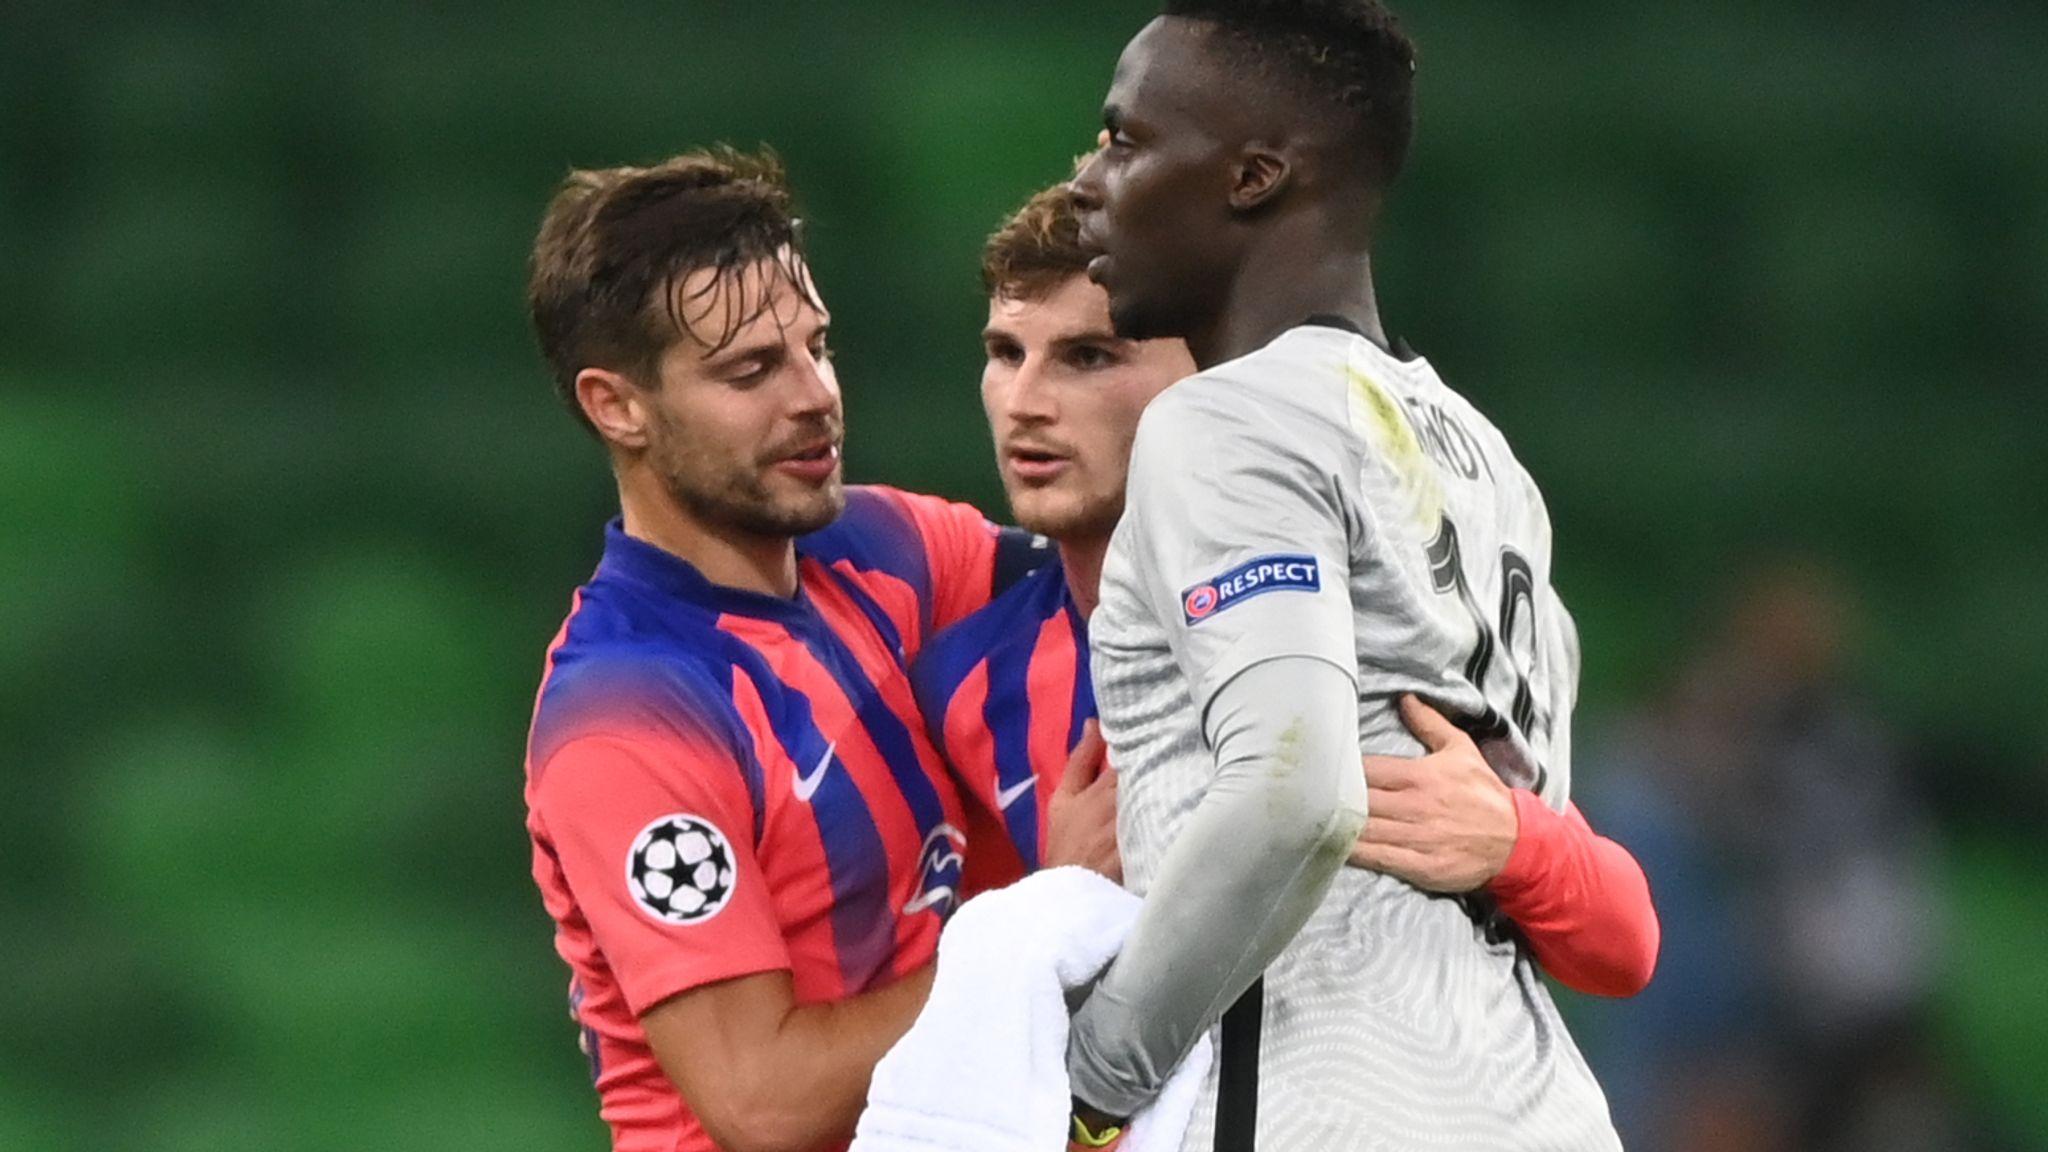 Krasnodar 0-4 Chelsea: Hakim Ziyech scores first goal for Blues in rampant  win   Football News   Sky Sports